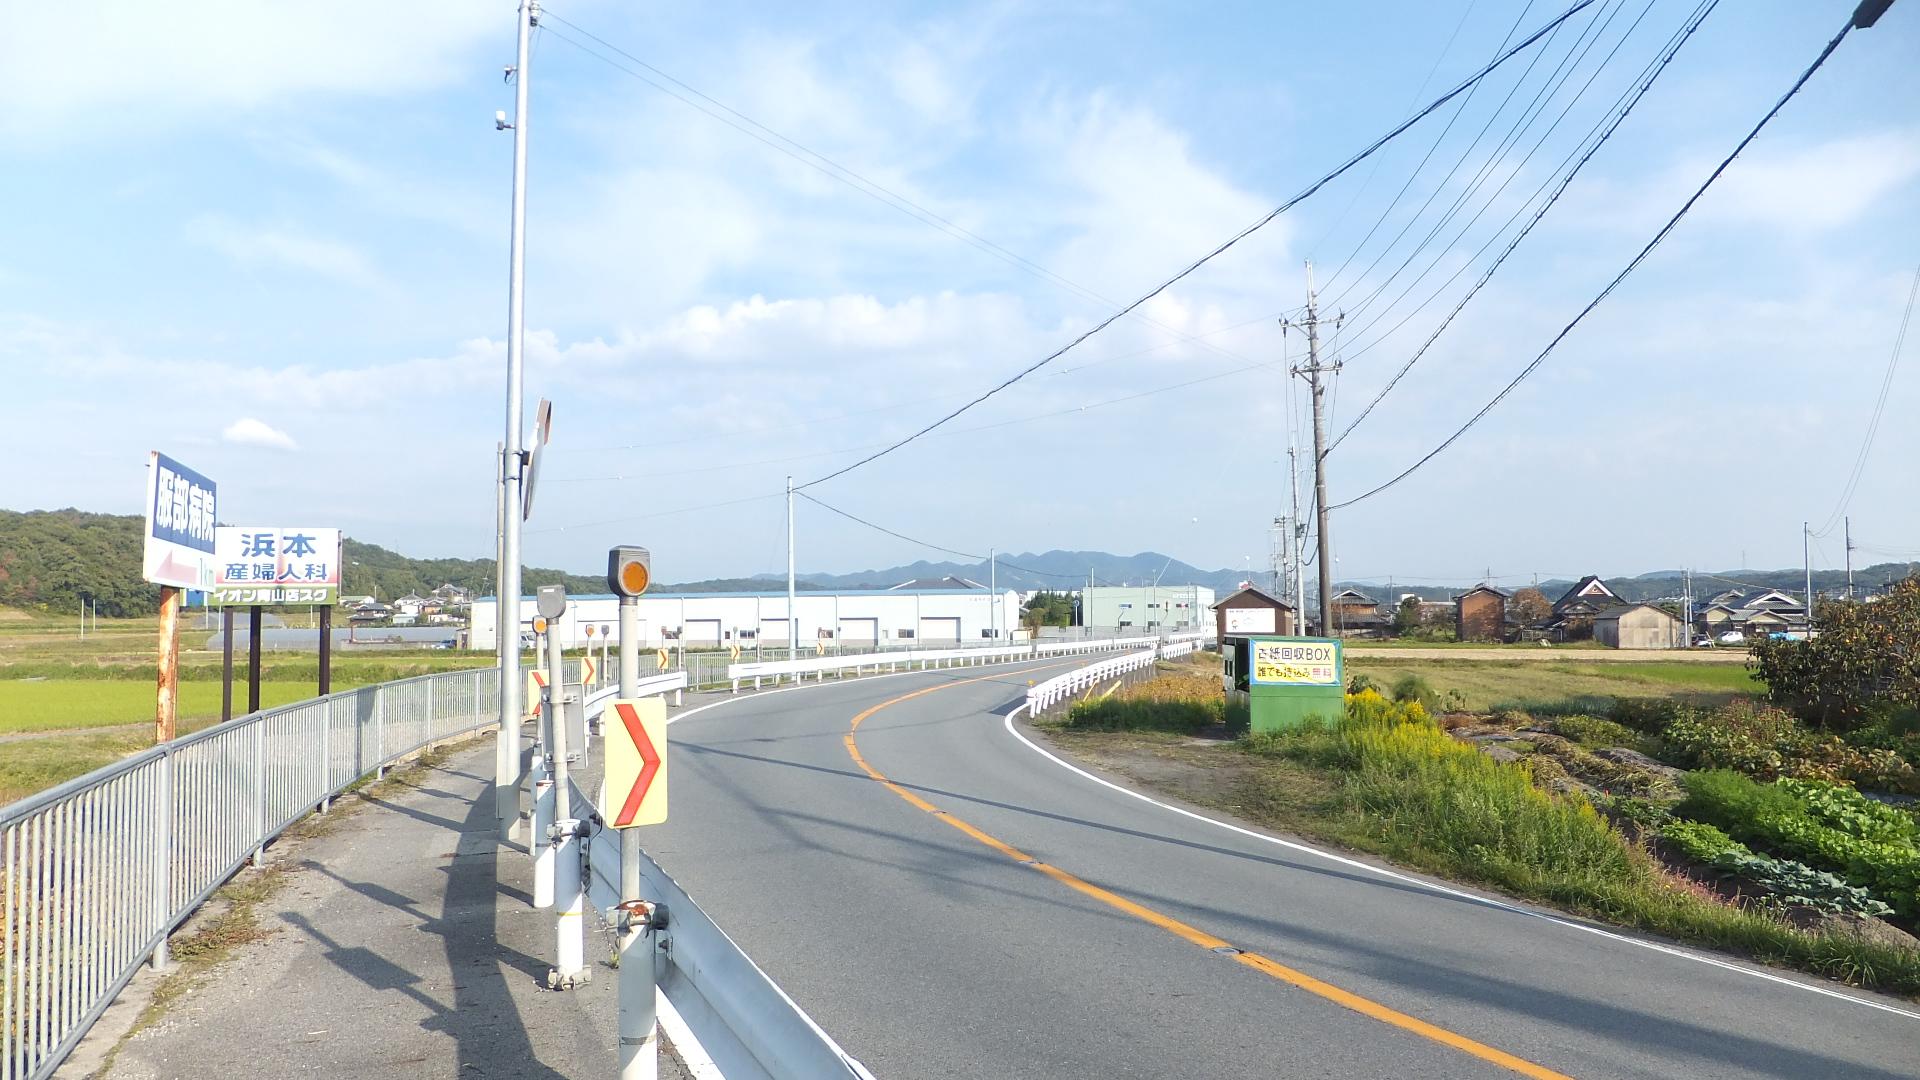 File Shijimitown Abuta Mikicity Hyogopref Hyogoprefecturtal Road